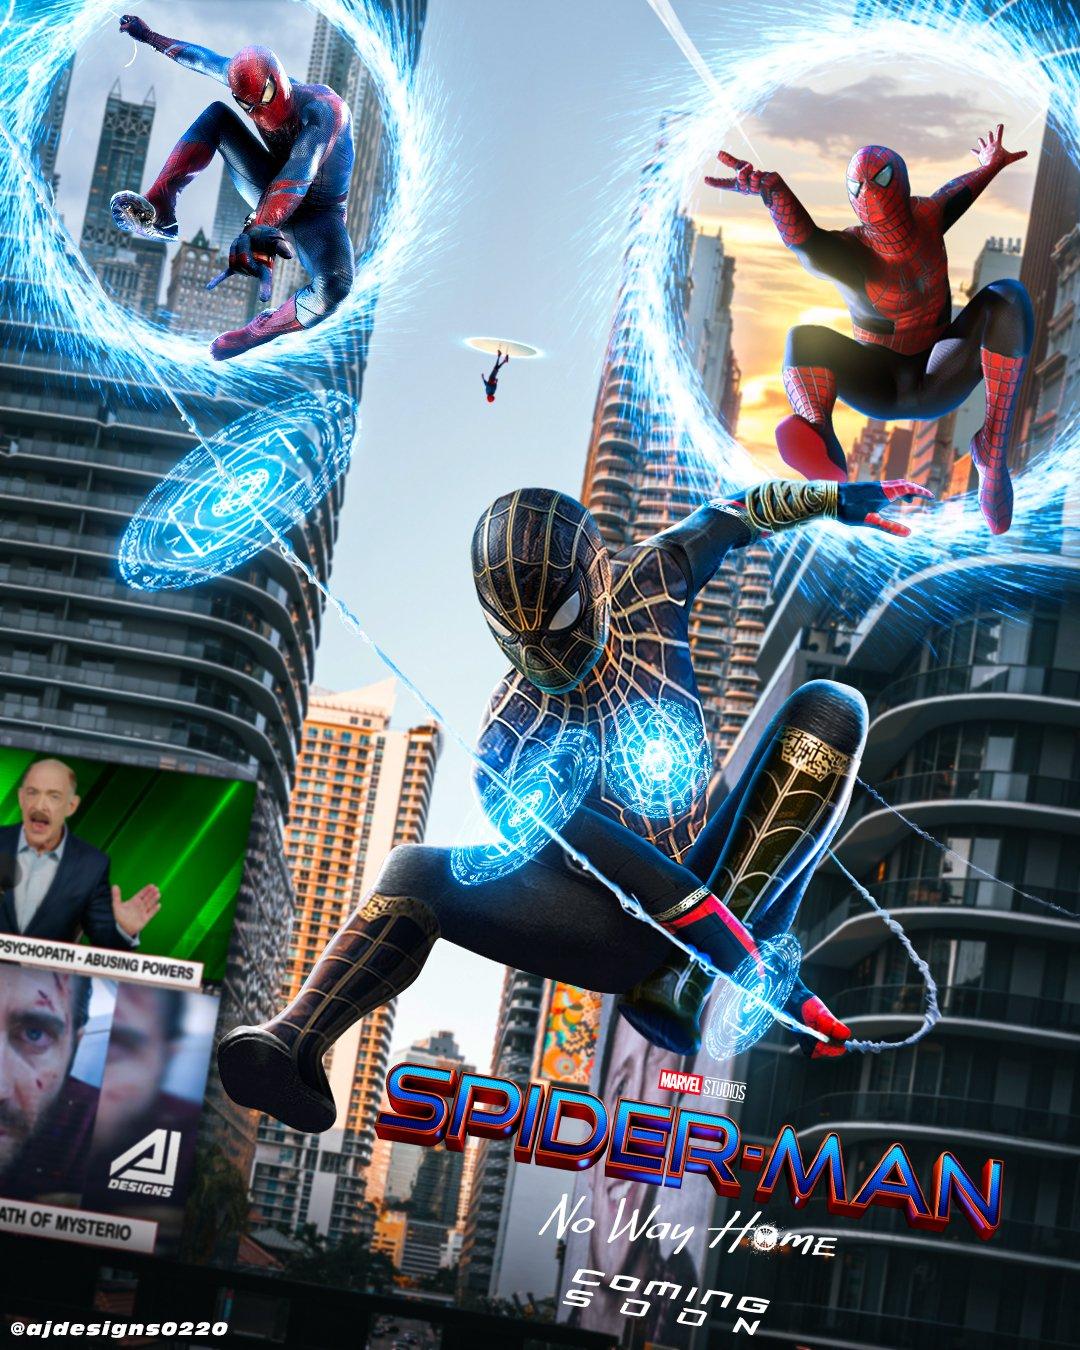 spiderman no way home postar fan